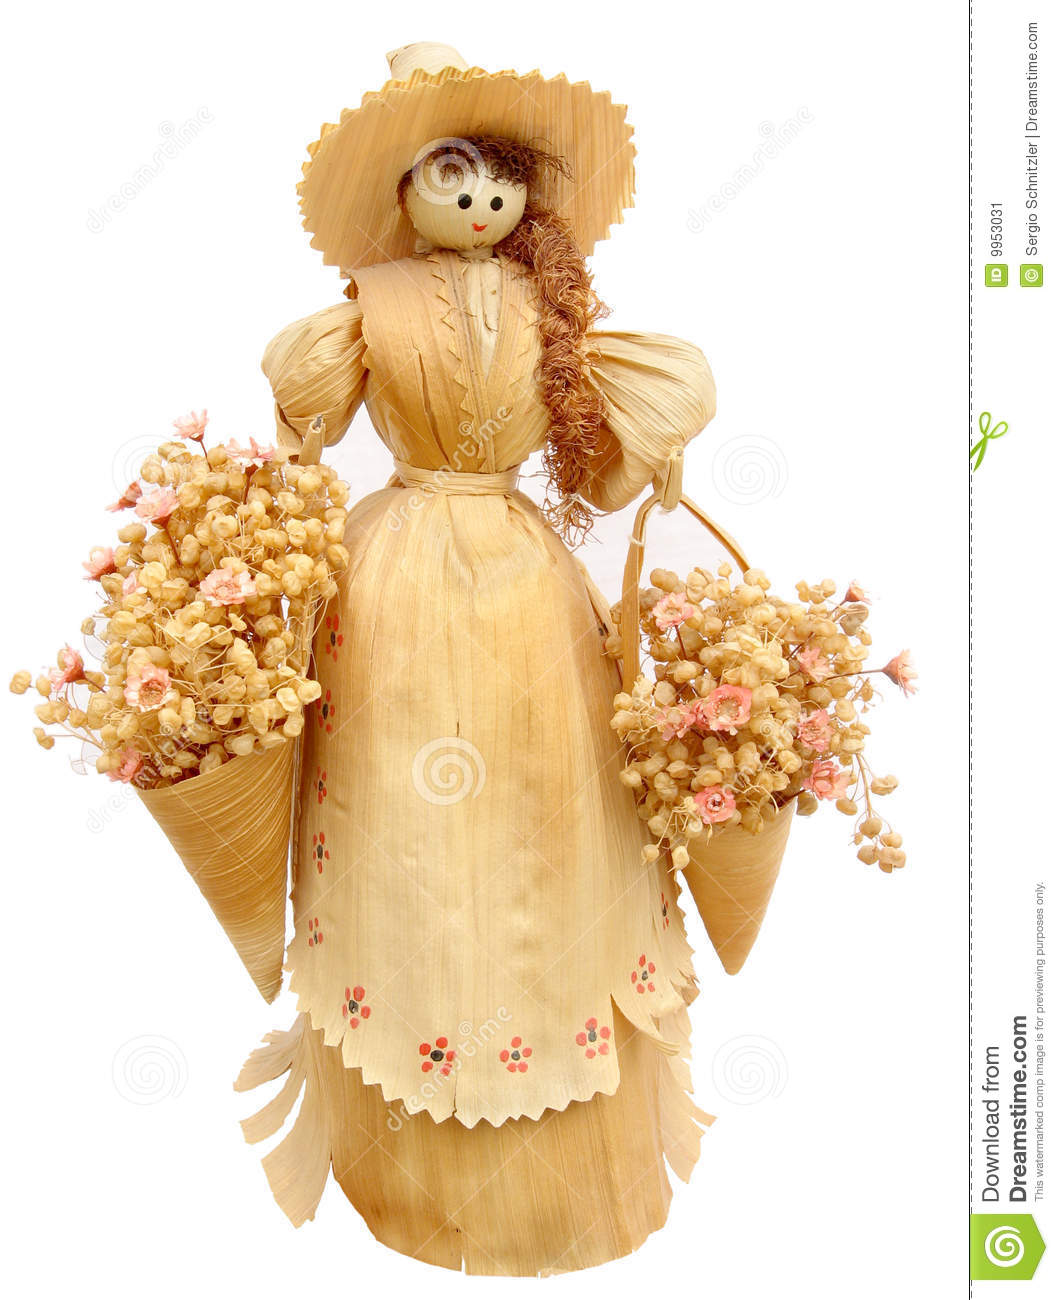 Corn Husk Doll Stock Image.